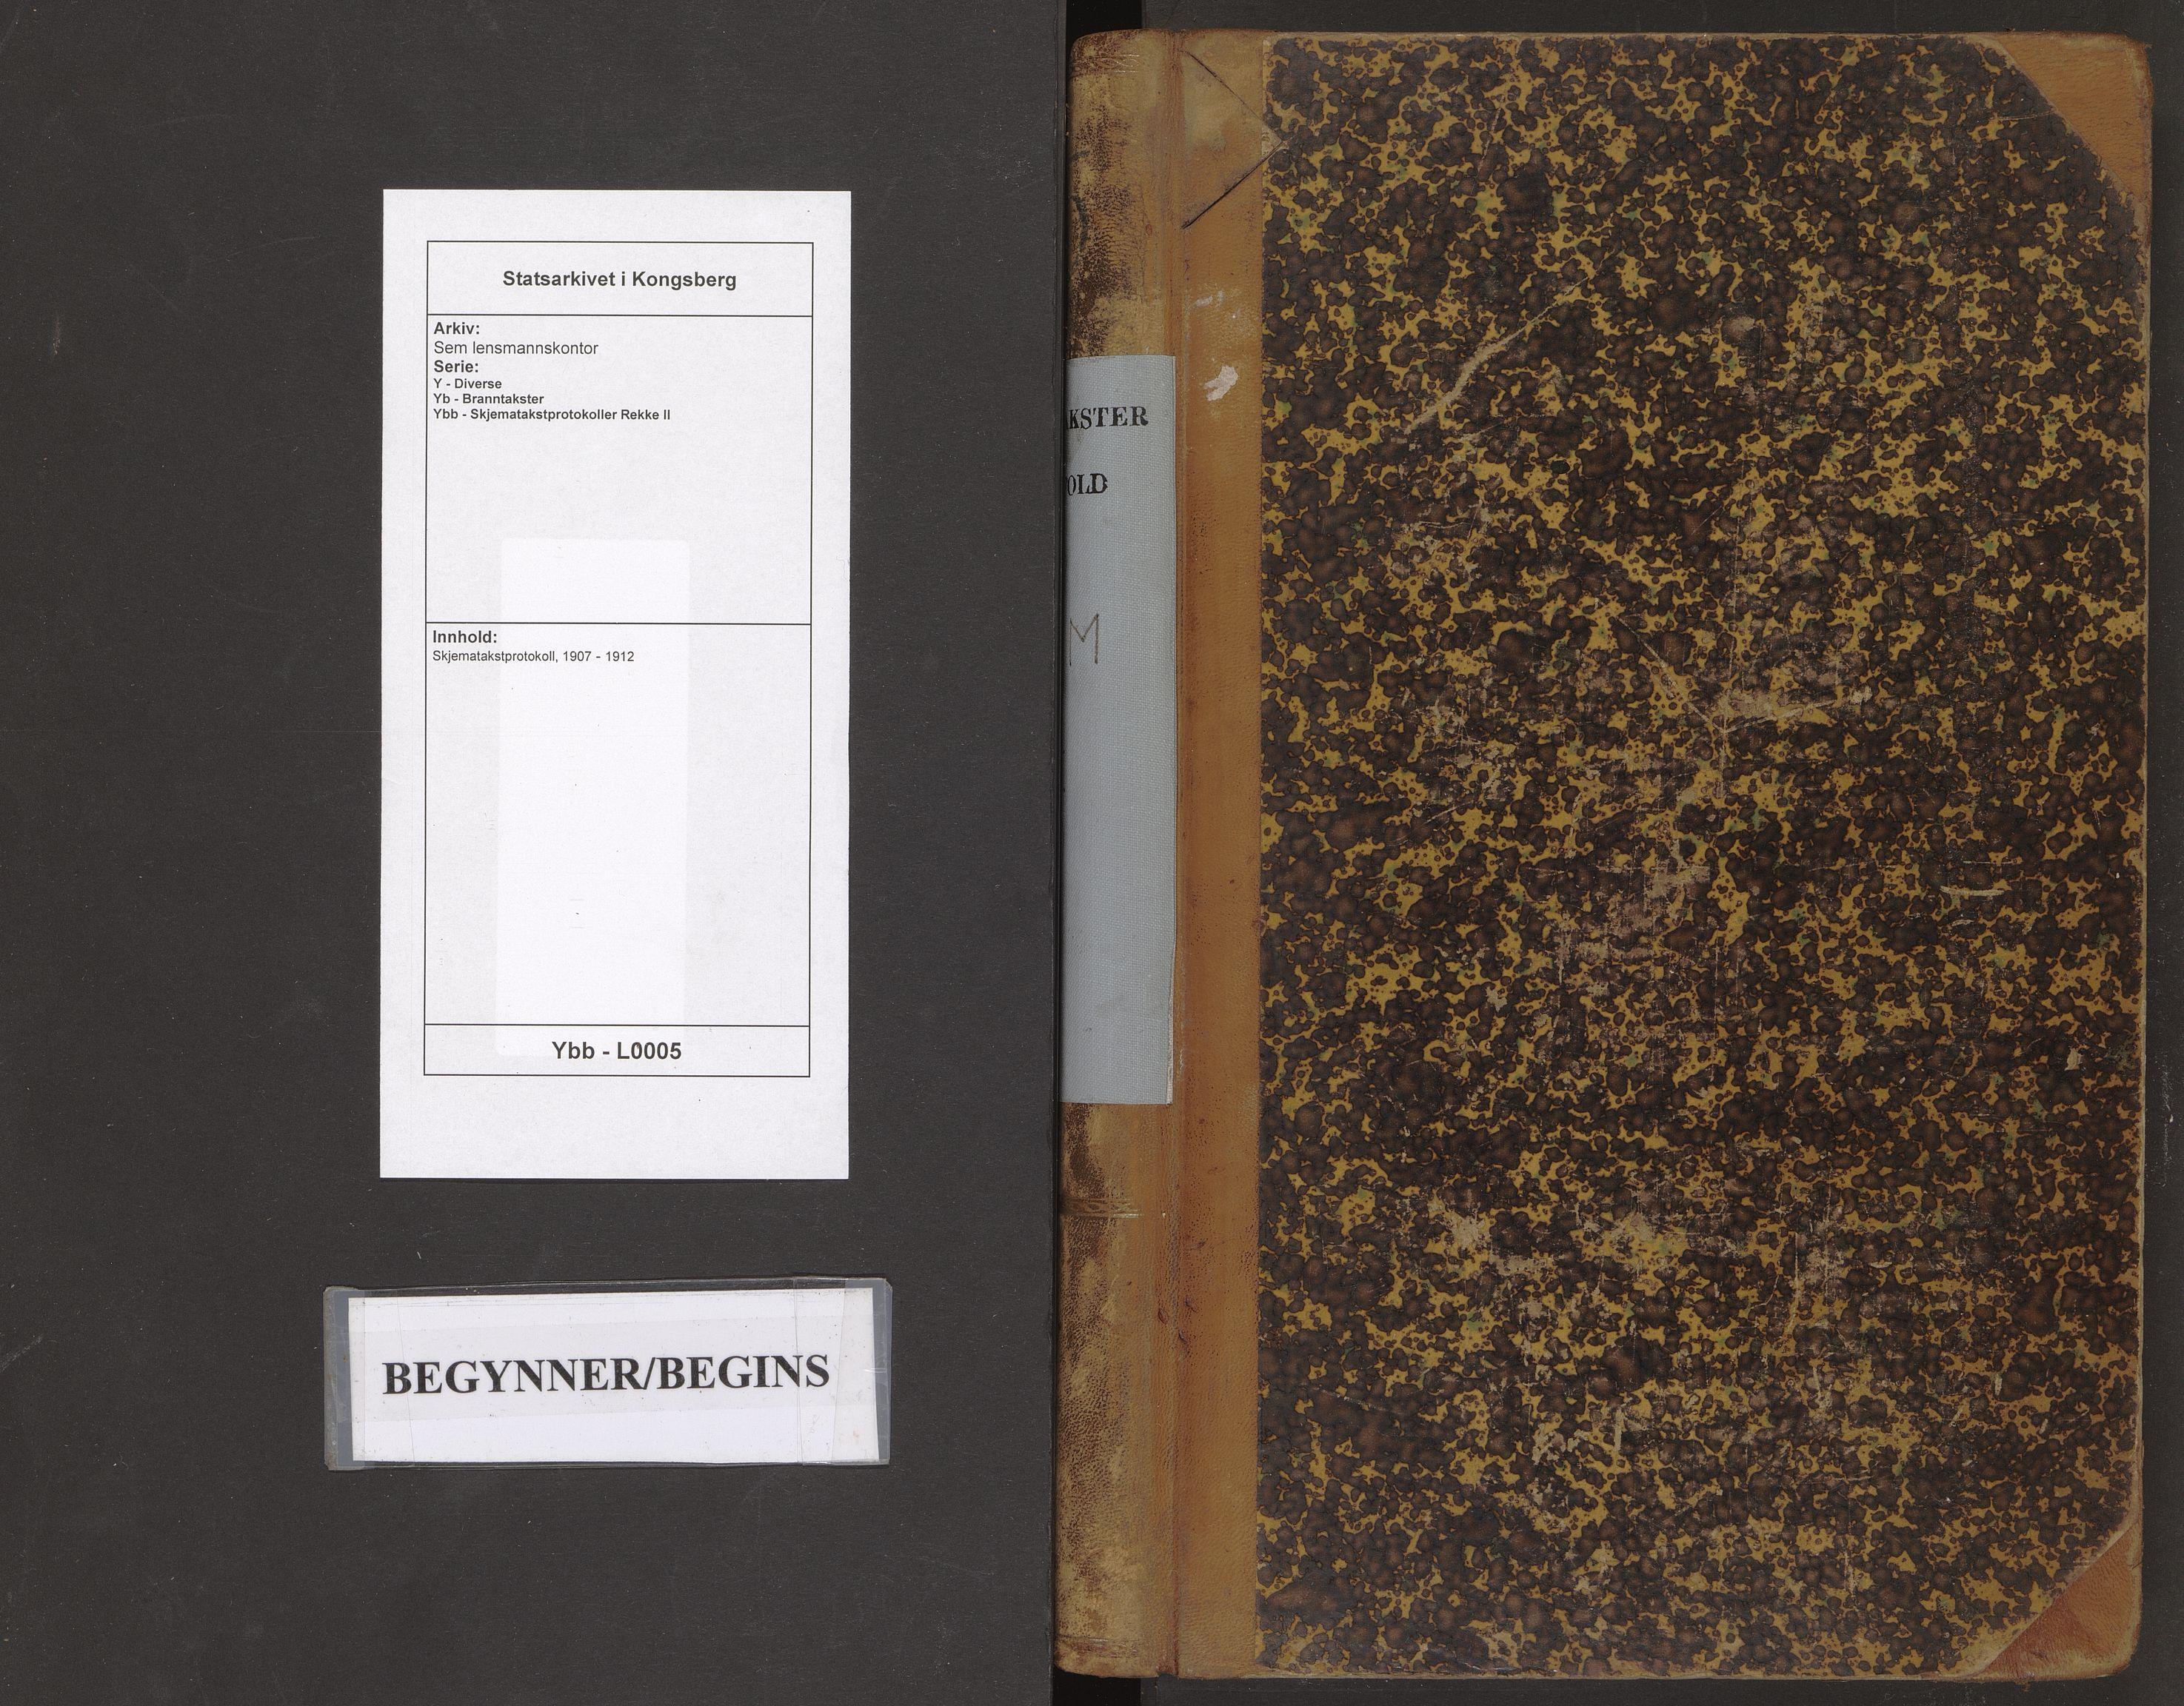 SAKO, Sem lensmannskontor, Y/Yb/Ybb/L0005: Skjematakstprotokoll, 1907-1912